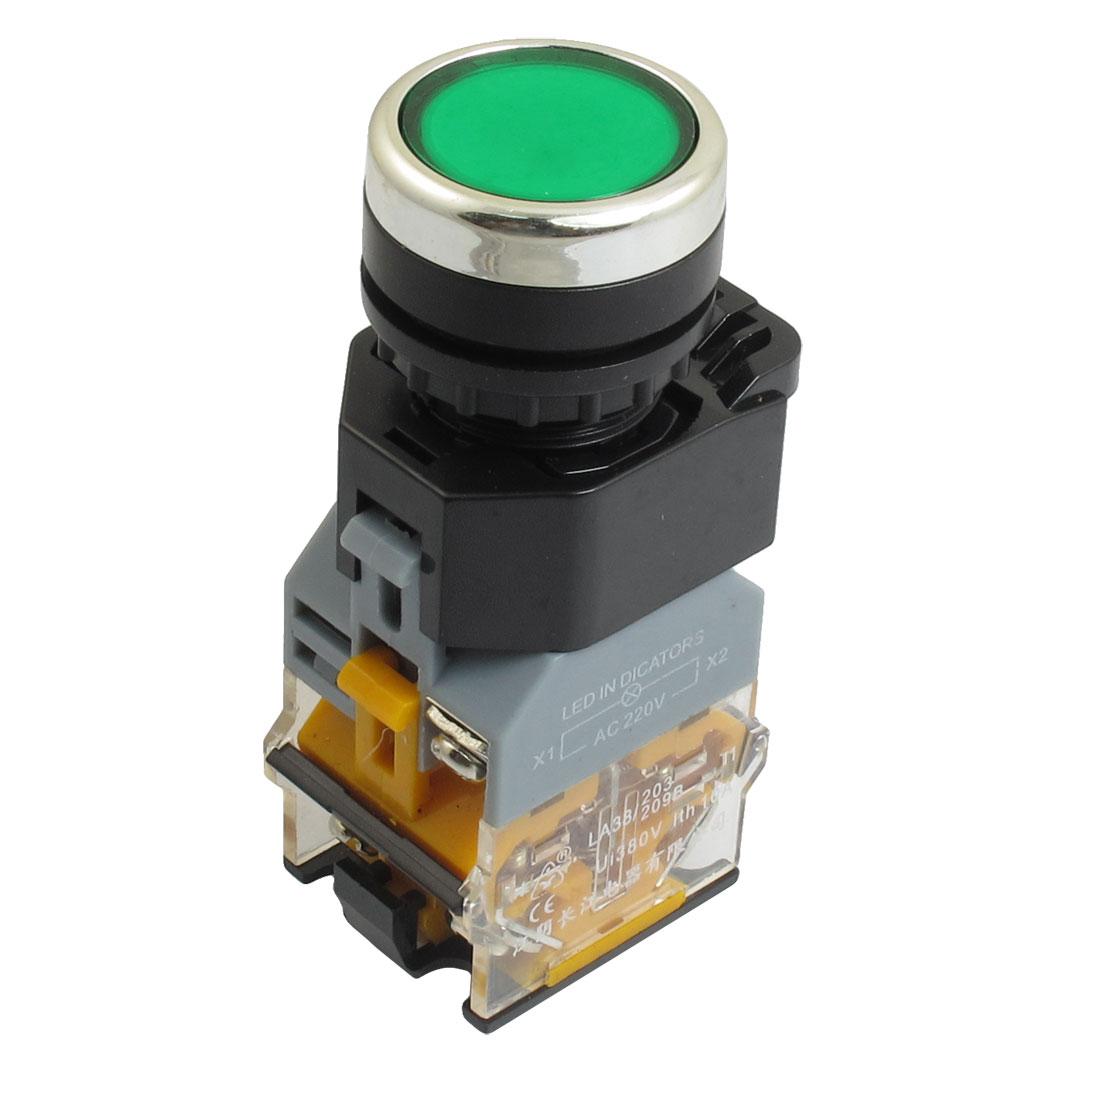 perko battery switch wiring diagram 6 volt minn kota